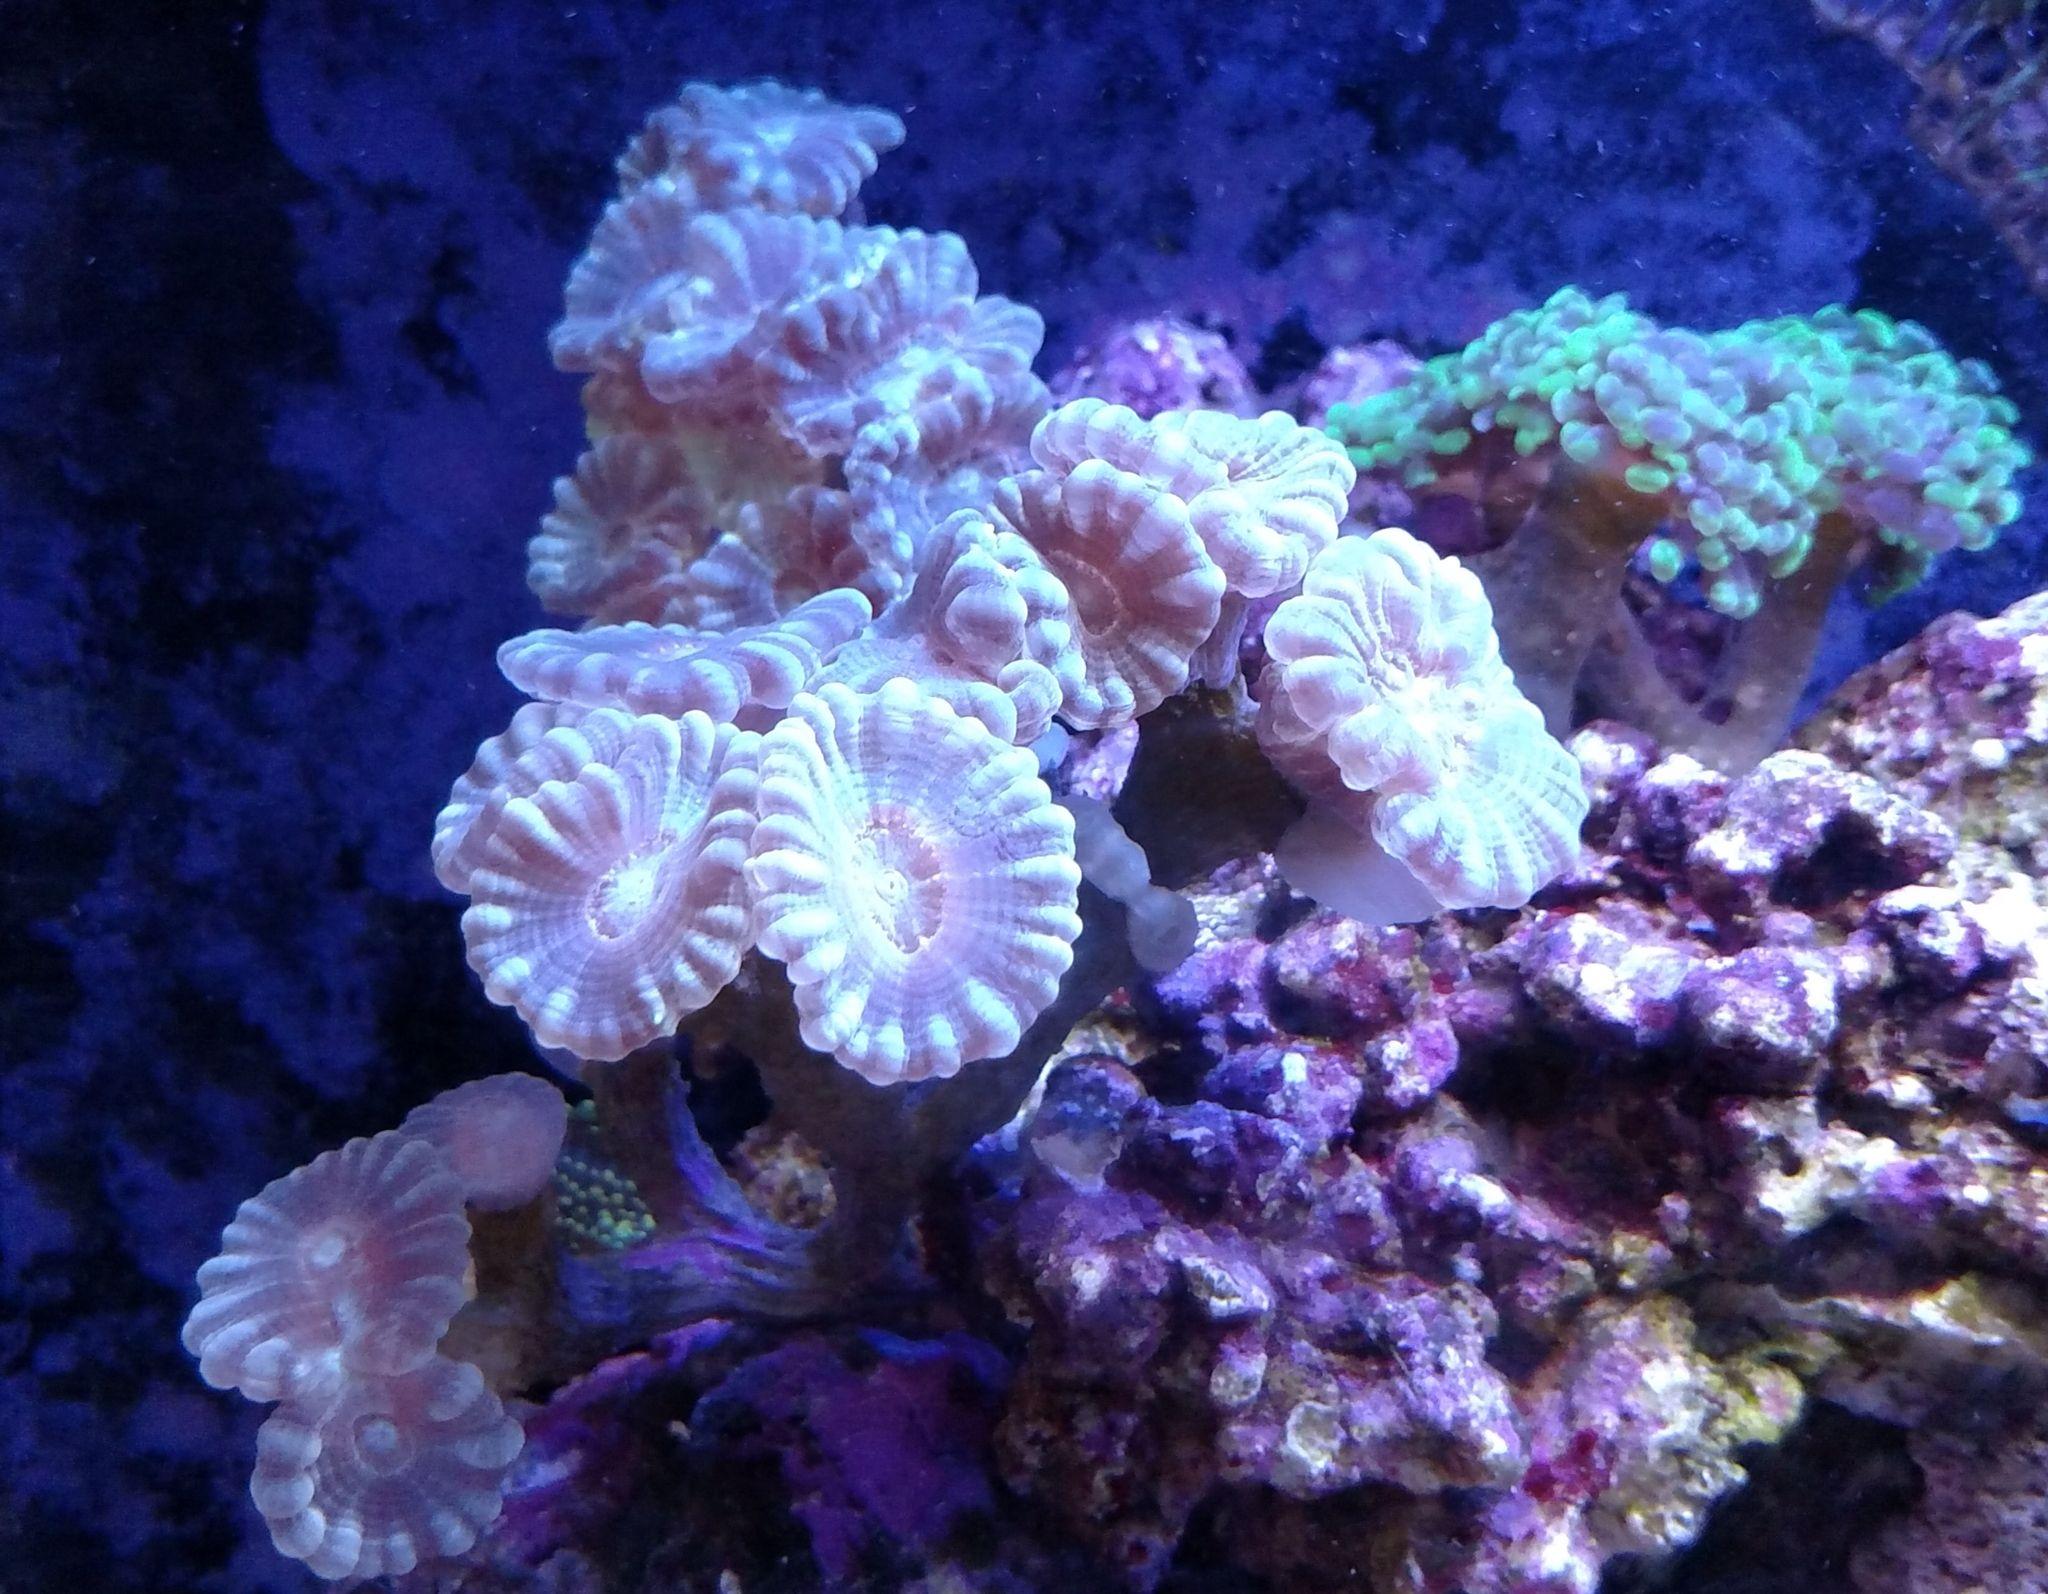 Candy Cane Coral Reef Tank Marine Life Saltwater Aquarium